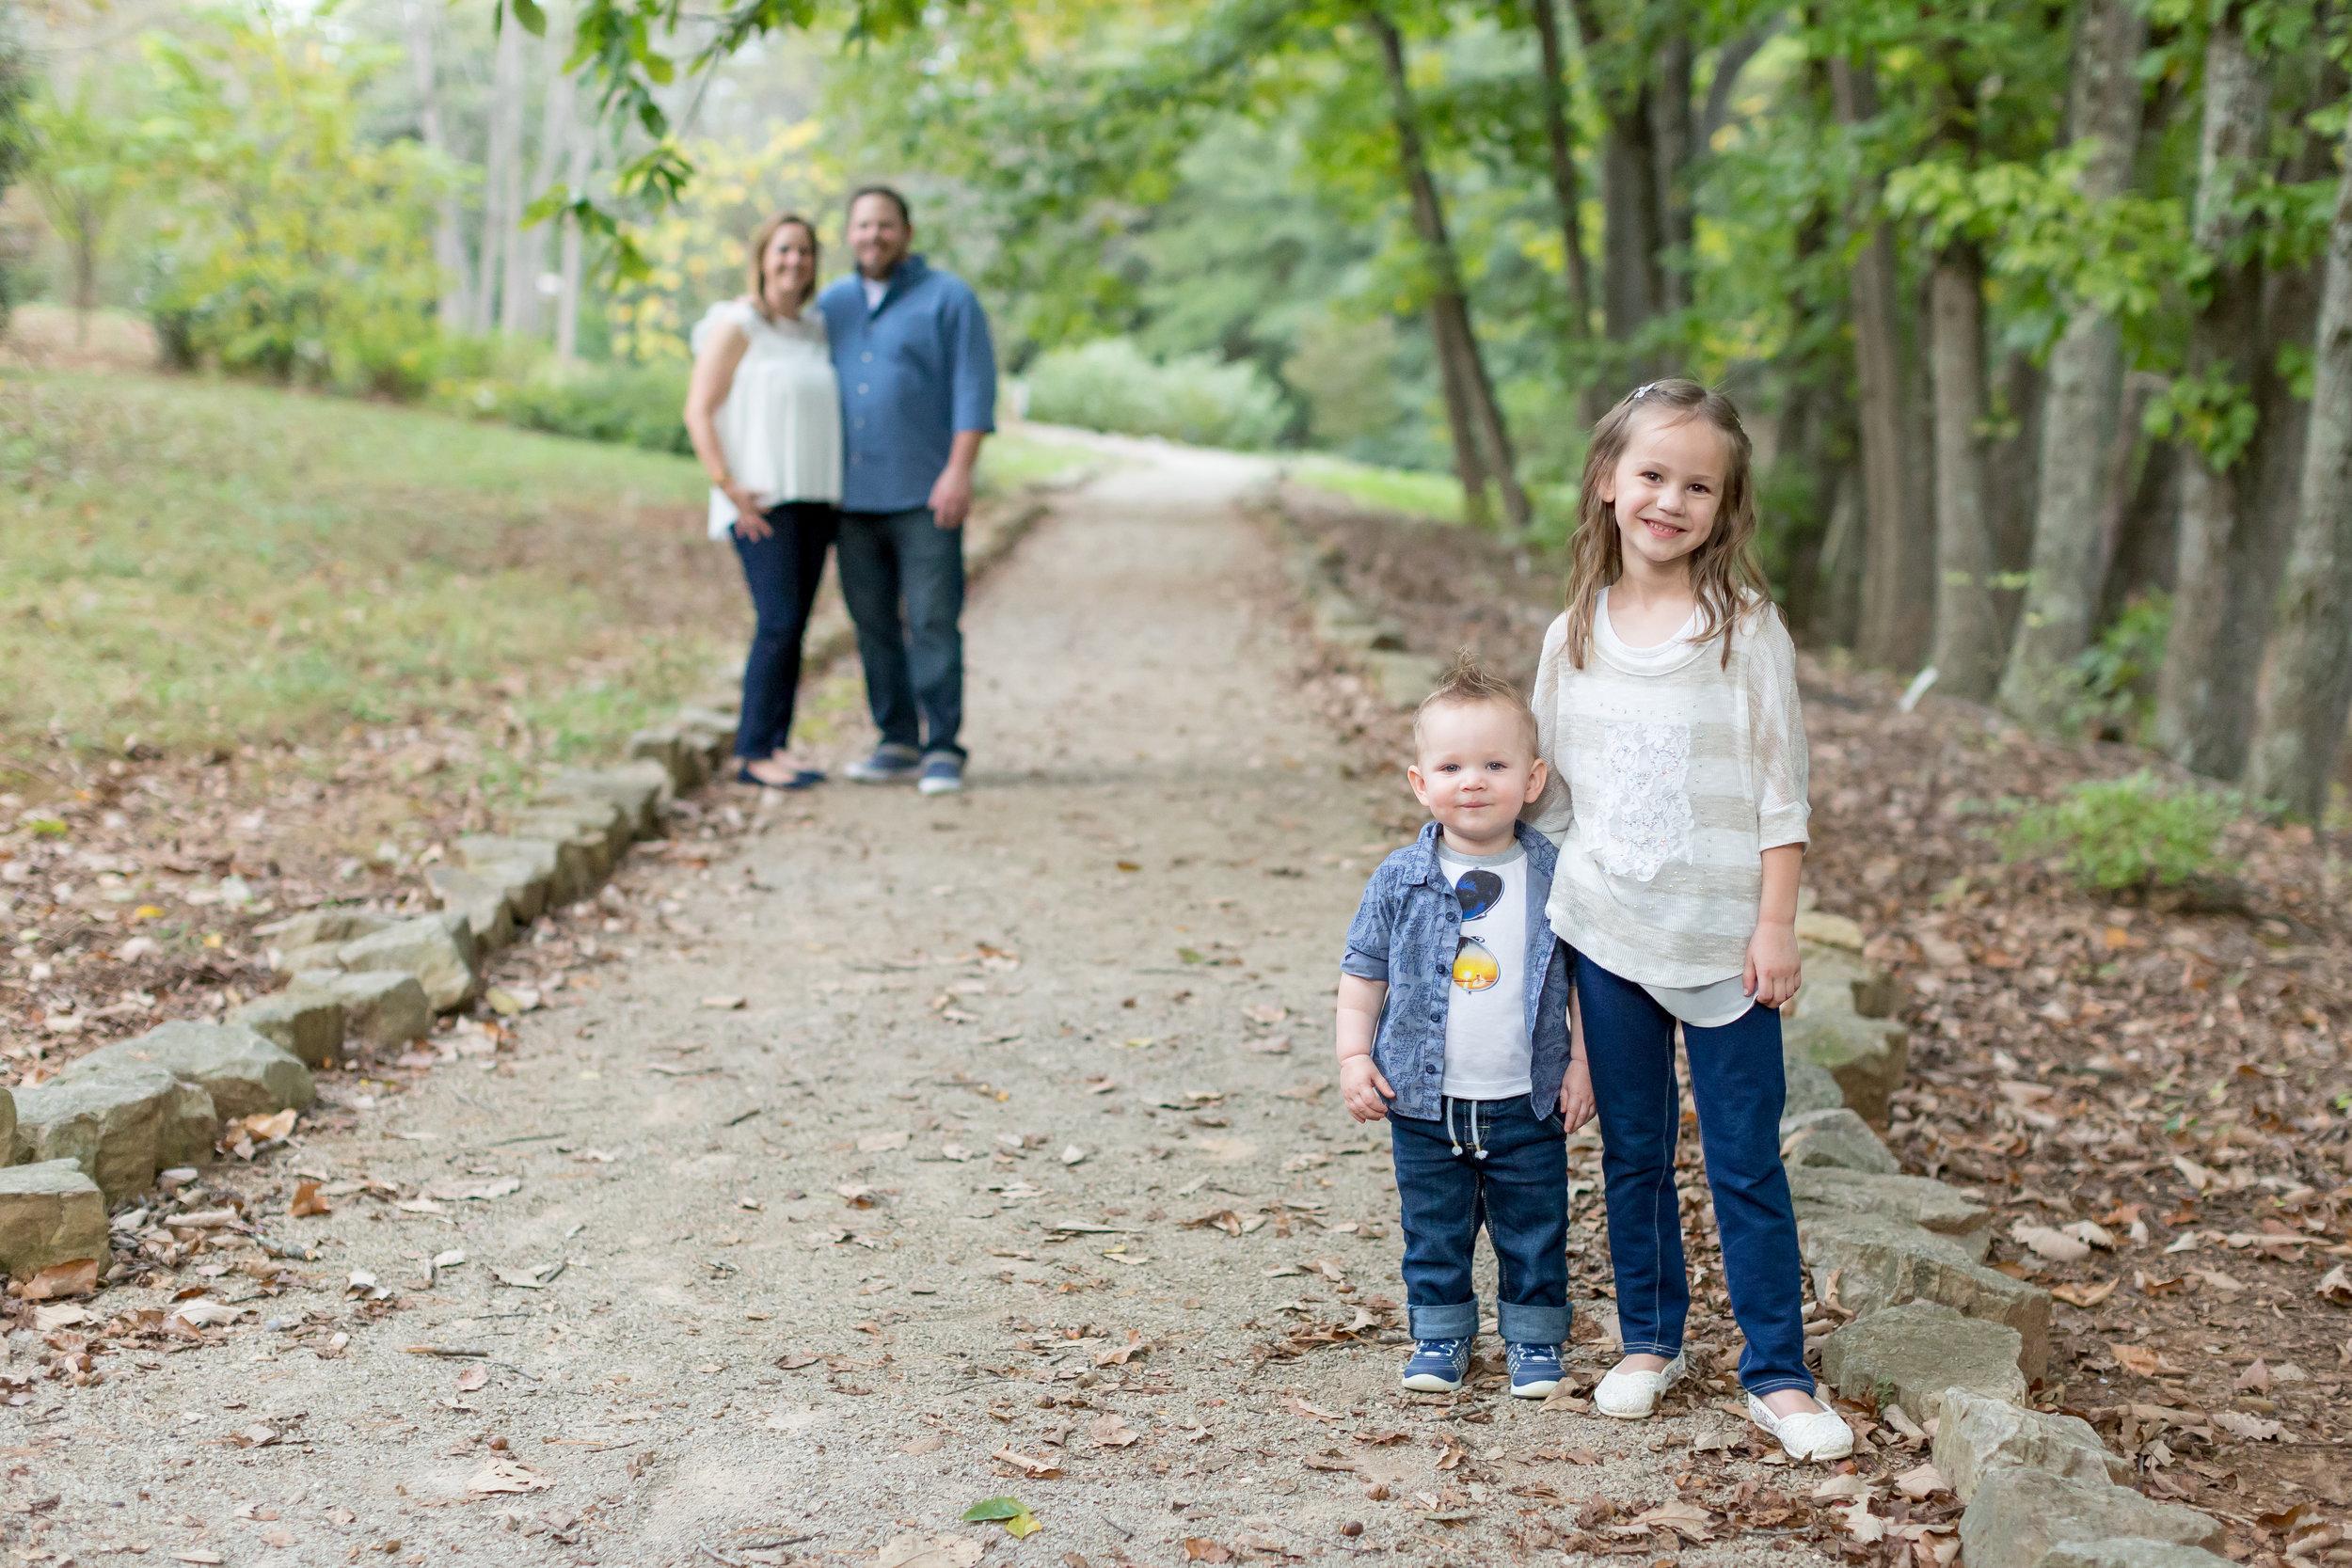 Sarasota Family Photographer   Siesta Key Family Photographer   Grace and Fire Photography